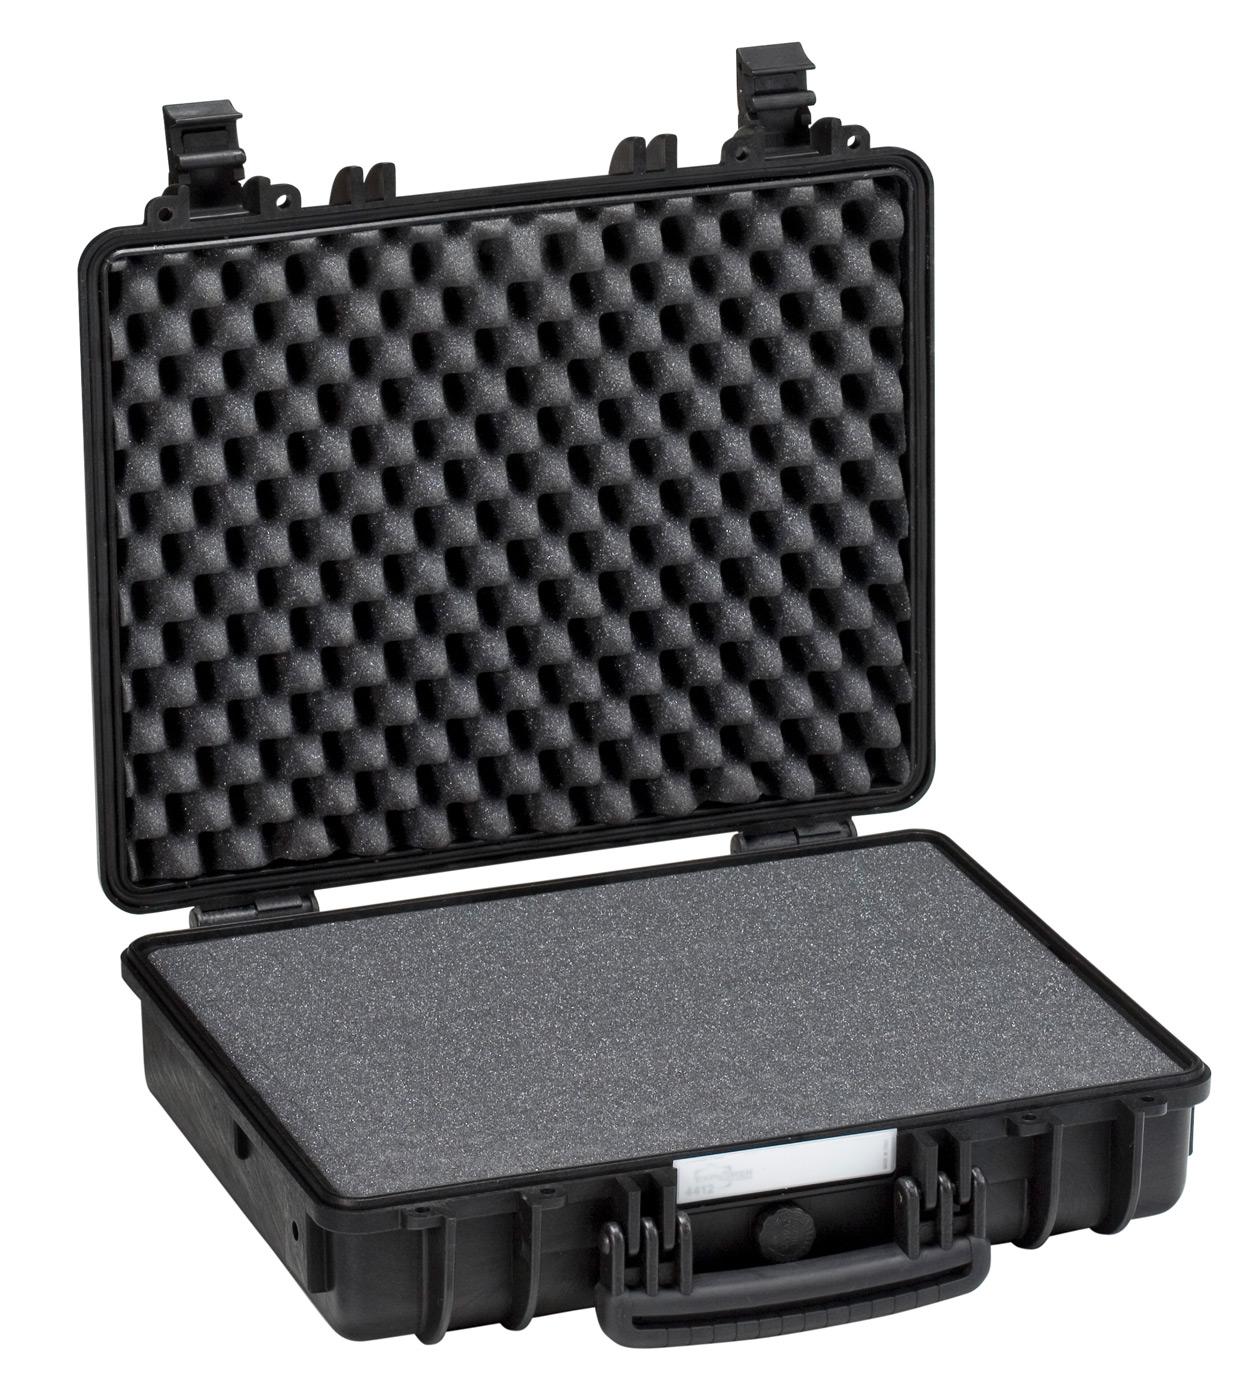 FOAM-4412 Espumas para maletas 4412